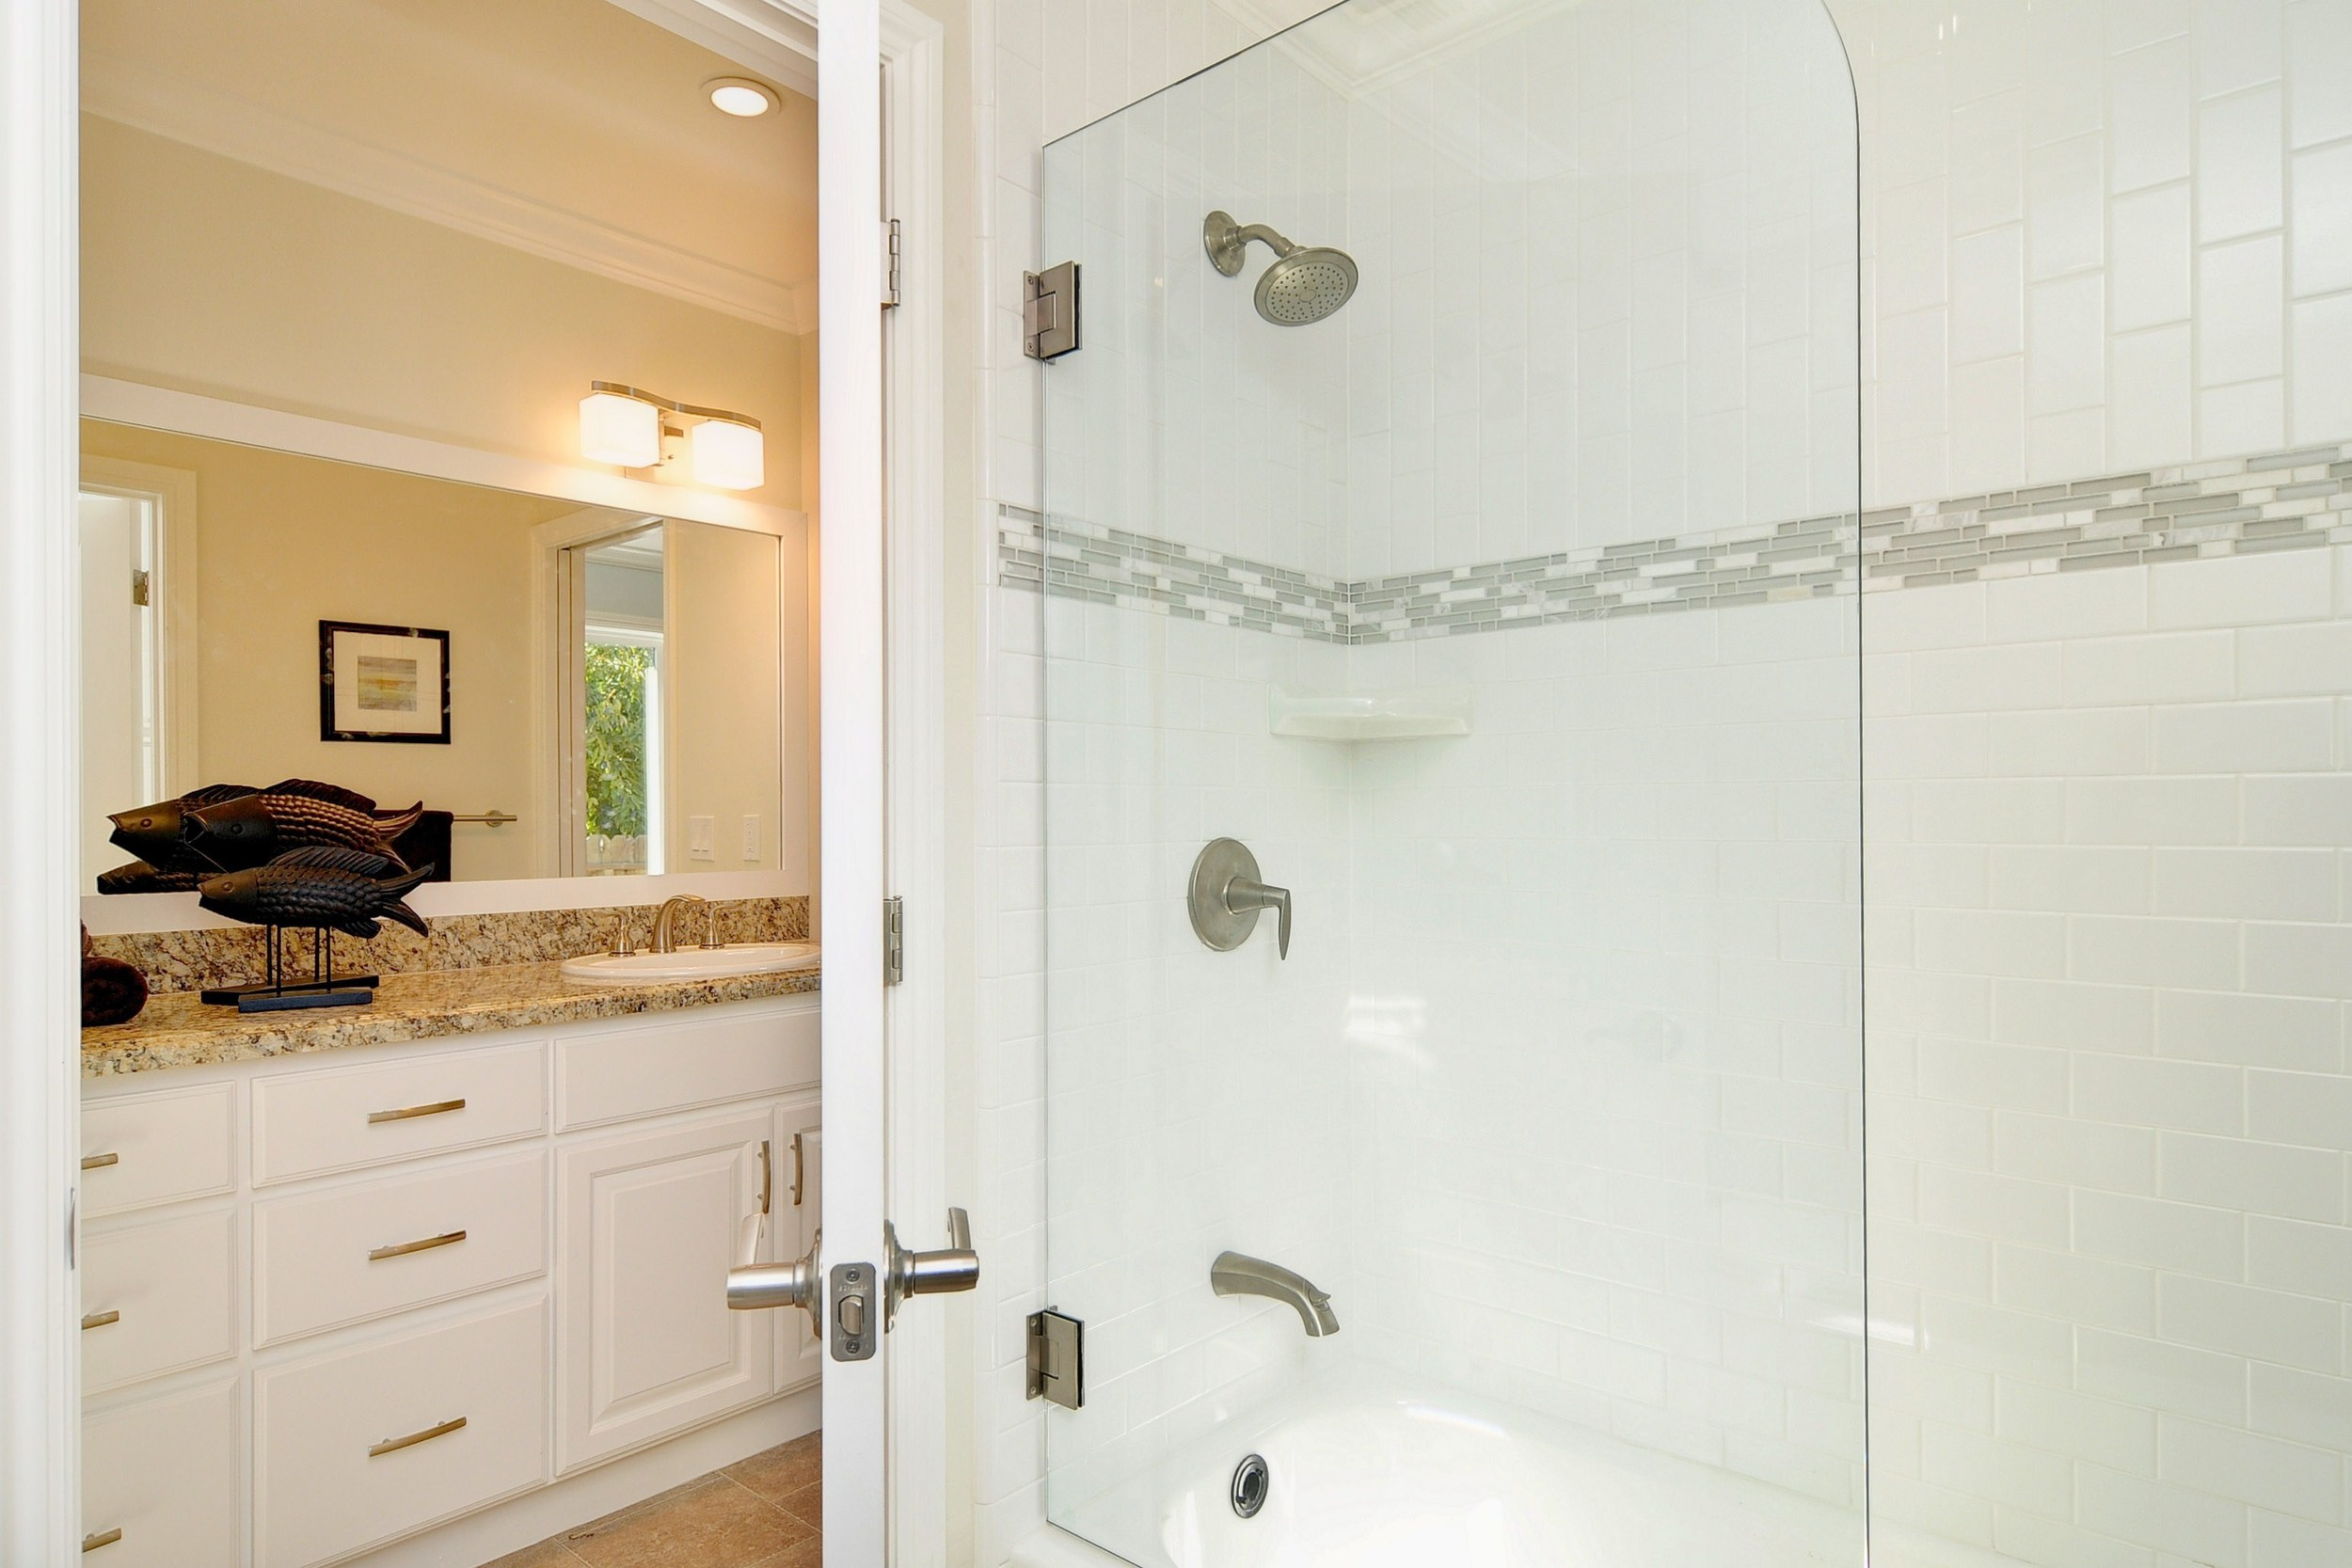 020_Bathroom (2).jpg